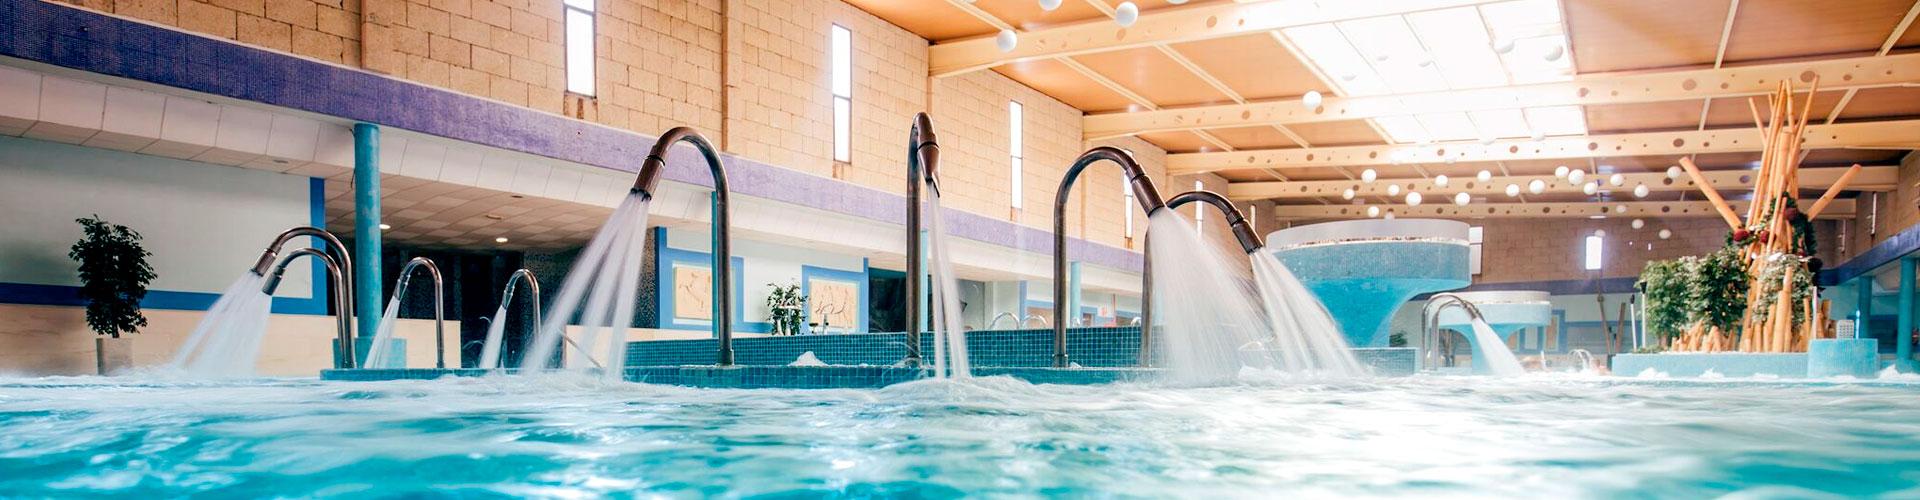 Wellness Aqua Club Termal